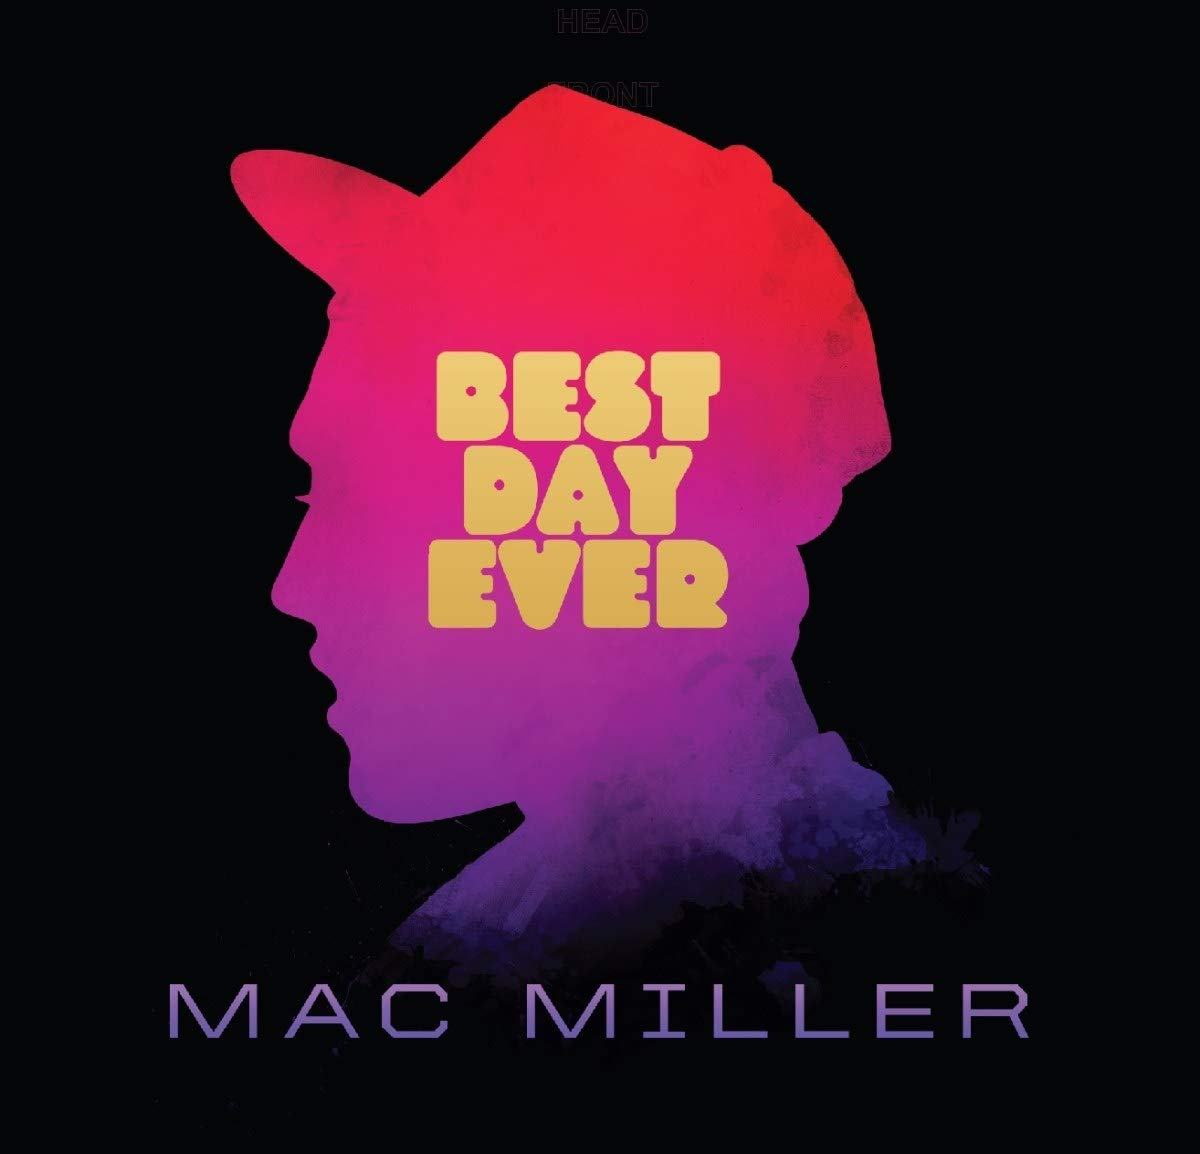 Mac Miller - Best Day Ever [2 LP] - Amazon.com Music